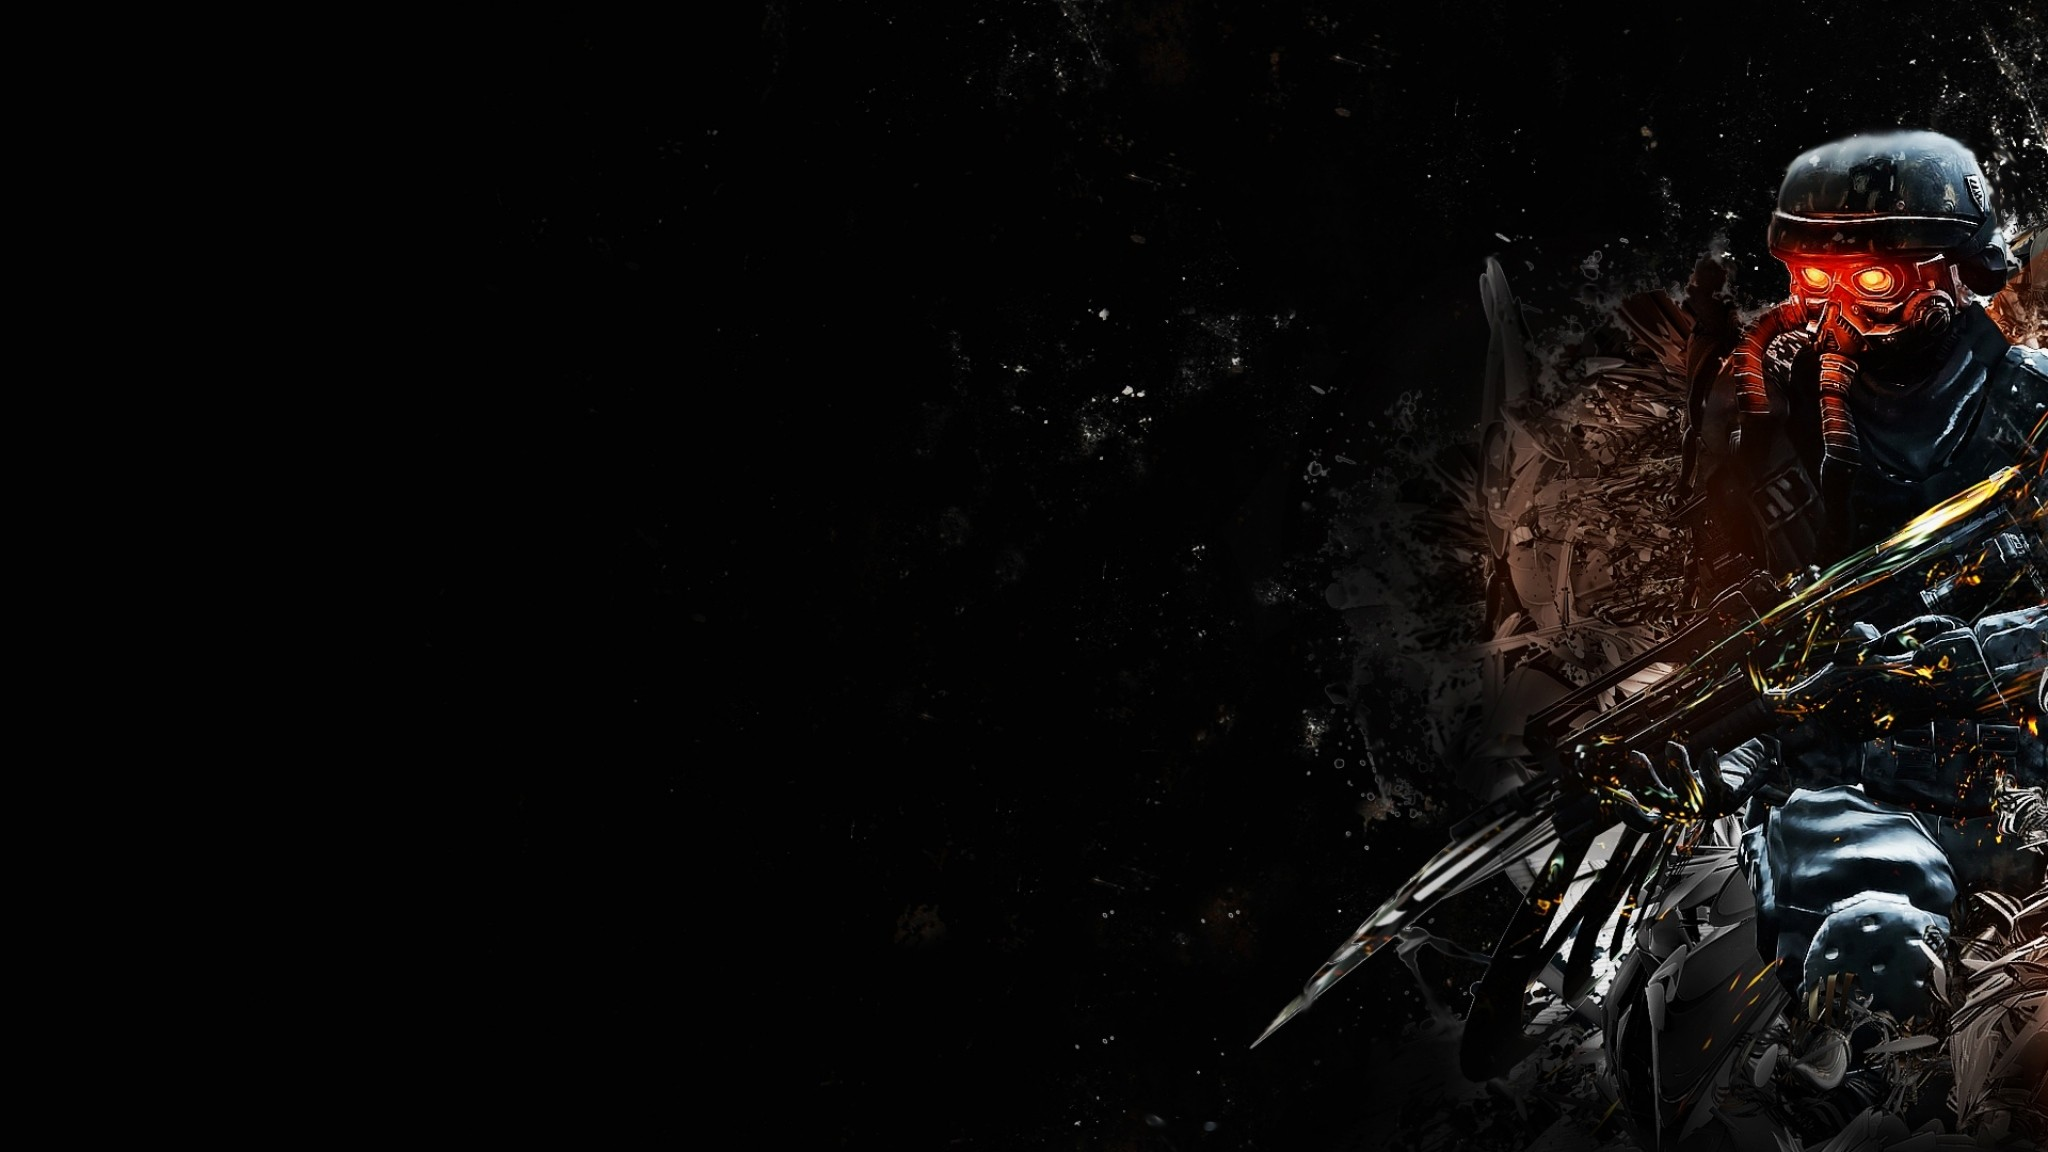 Wallpaper killzone, soldier, gun, look, graphics, background